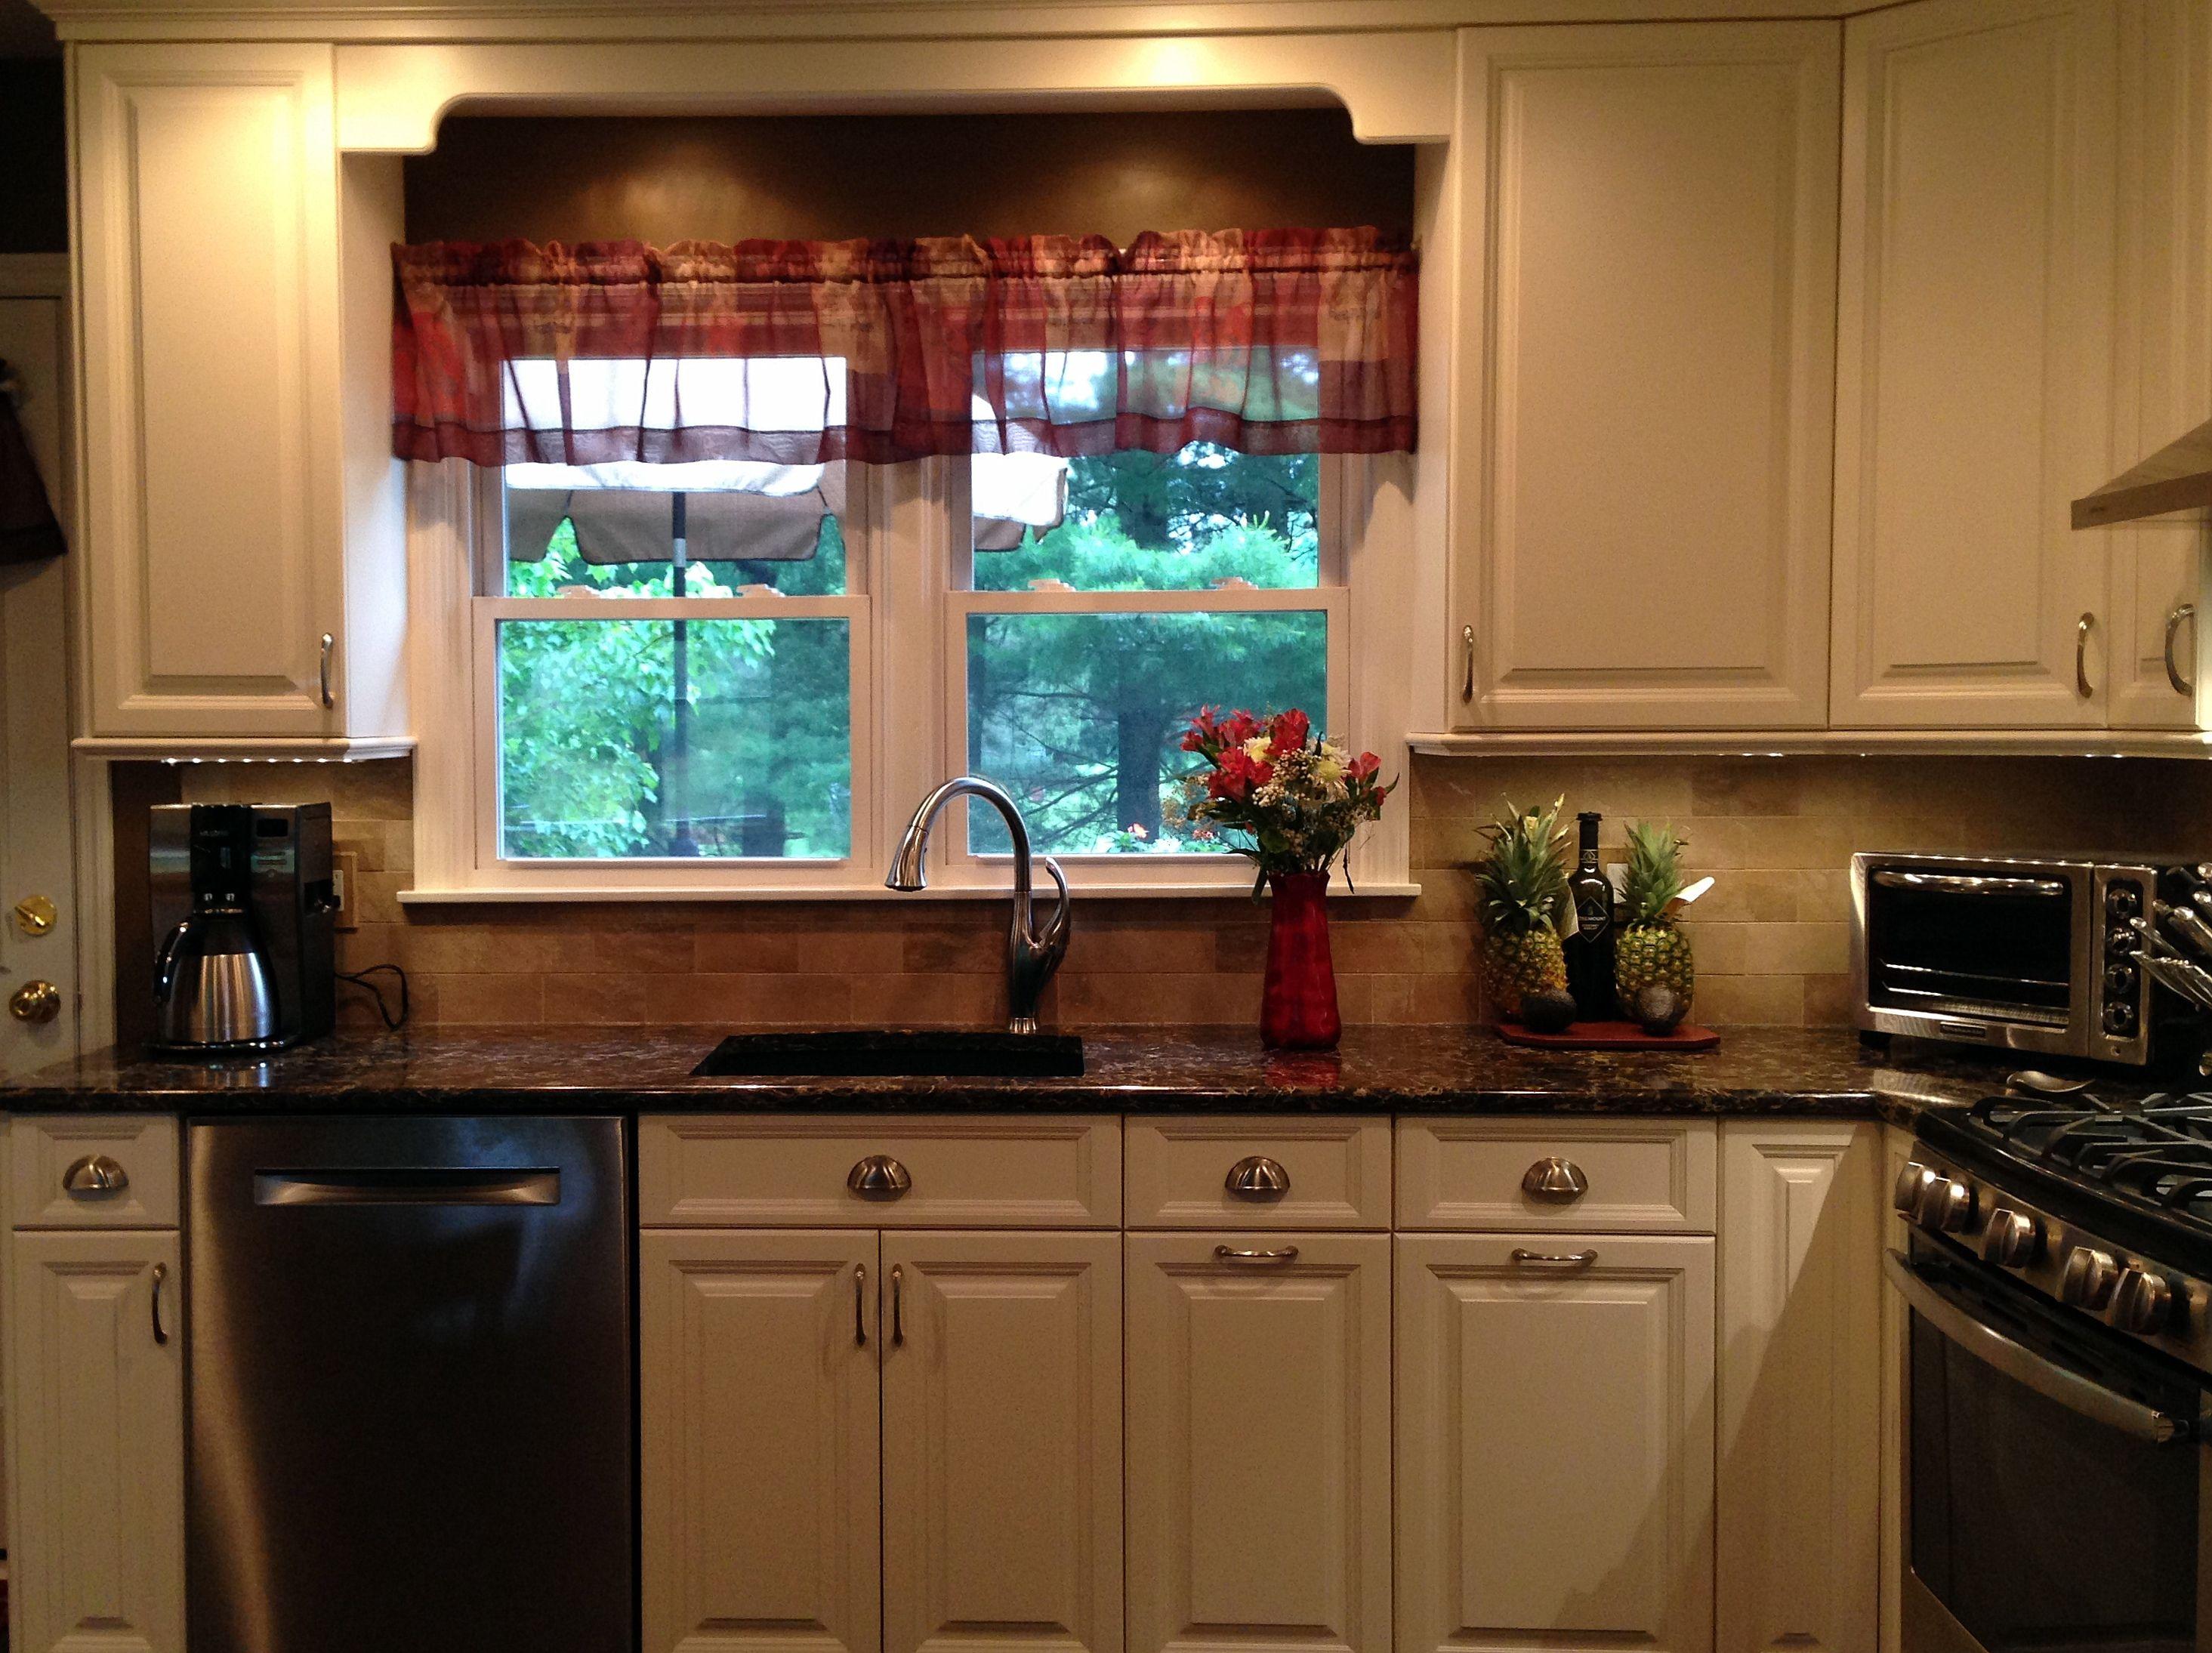 White Millbrook Kitchen With Laneshaw Quartz Countertops 5 Of 10 Kitchen Quartz Countertops Kitchen Cabinets